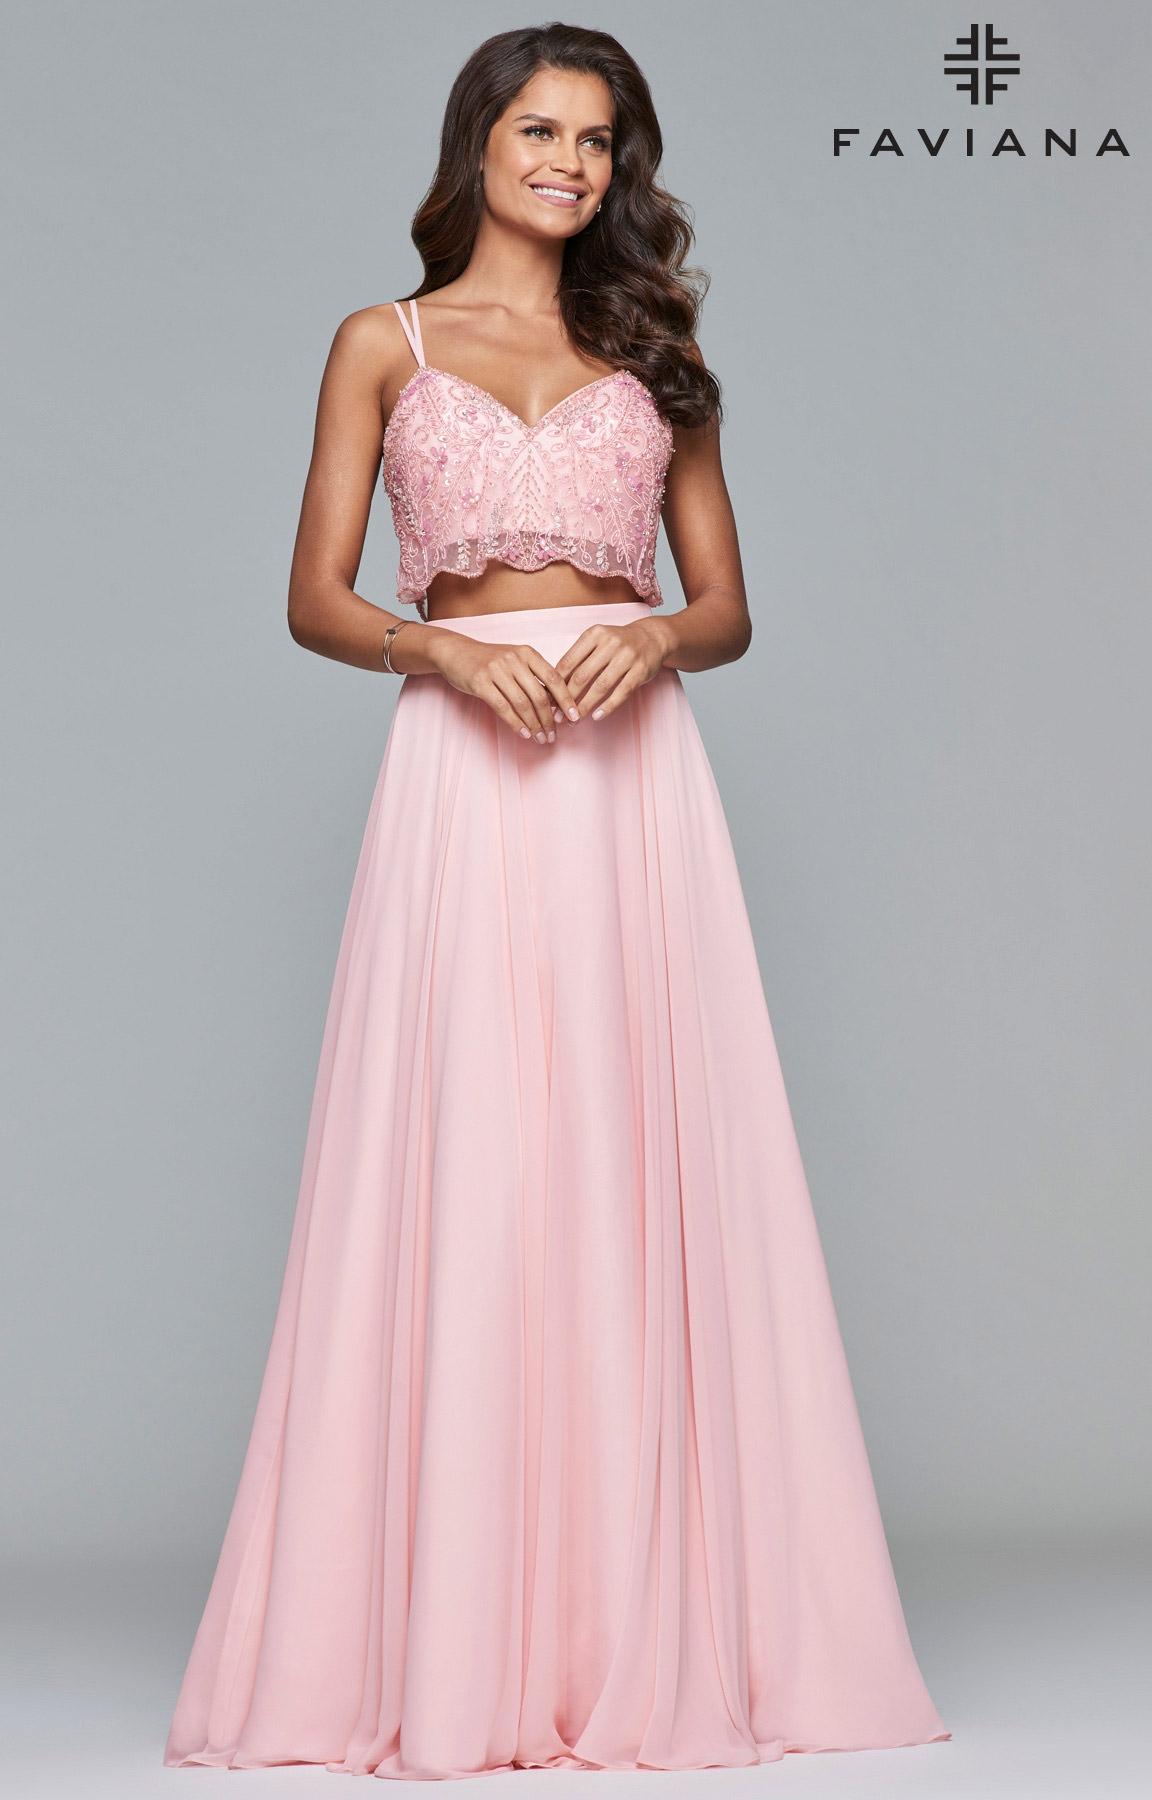 Faviana 10042 - 2 Piece A-Line Chiffon Prom Dress